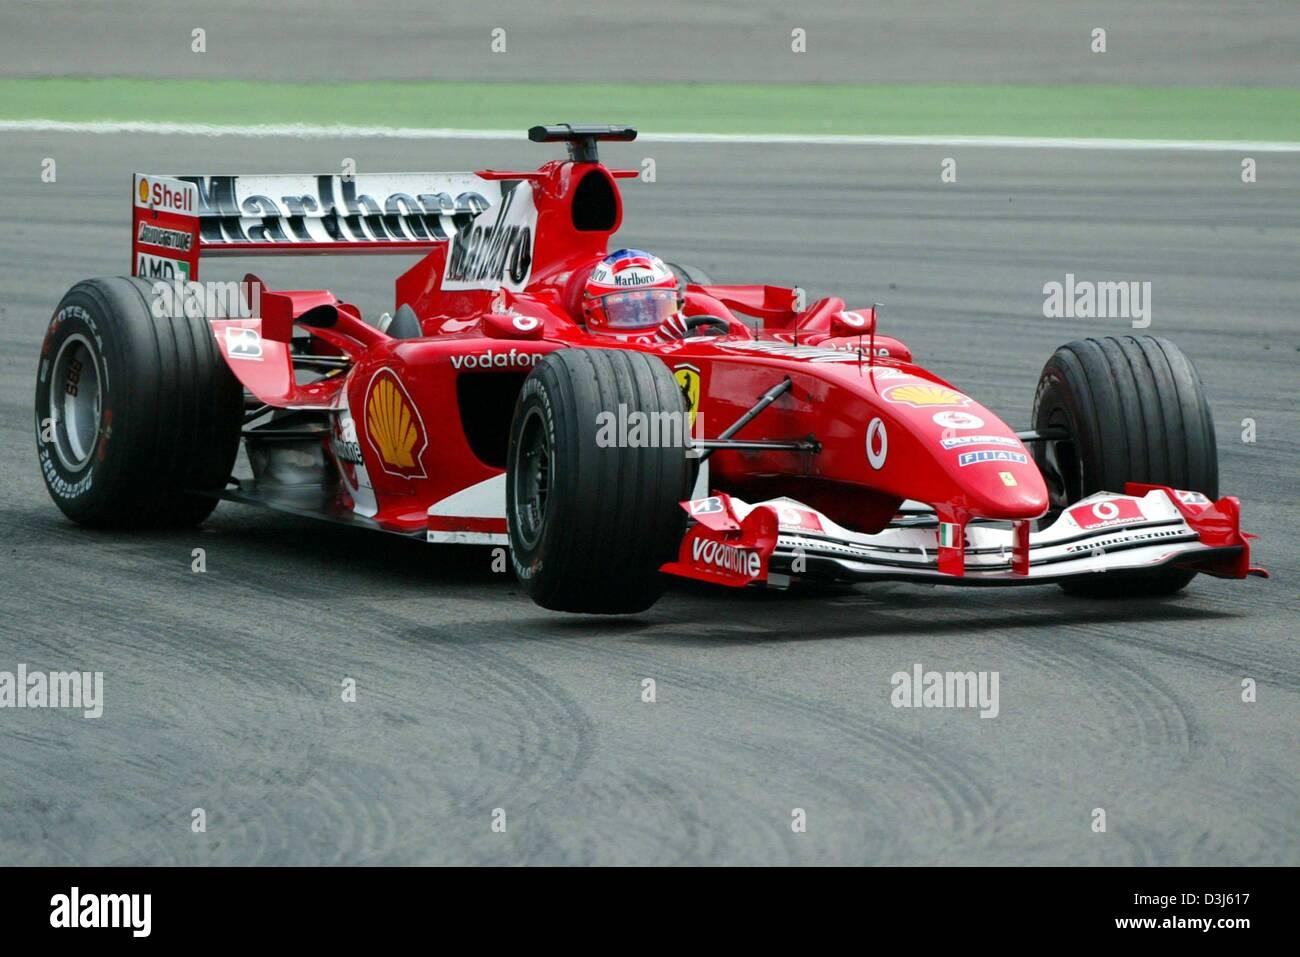 Dpa Brazilian Formula 1 Driver Rubens Barrichello Team Ferrari Stock Photo Alamy